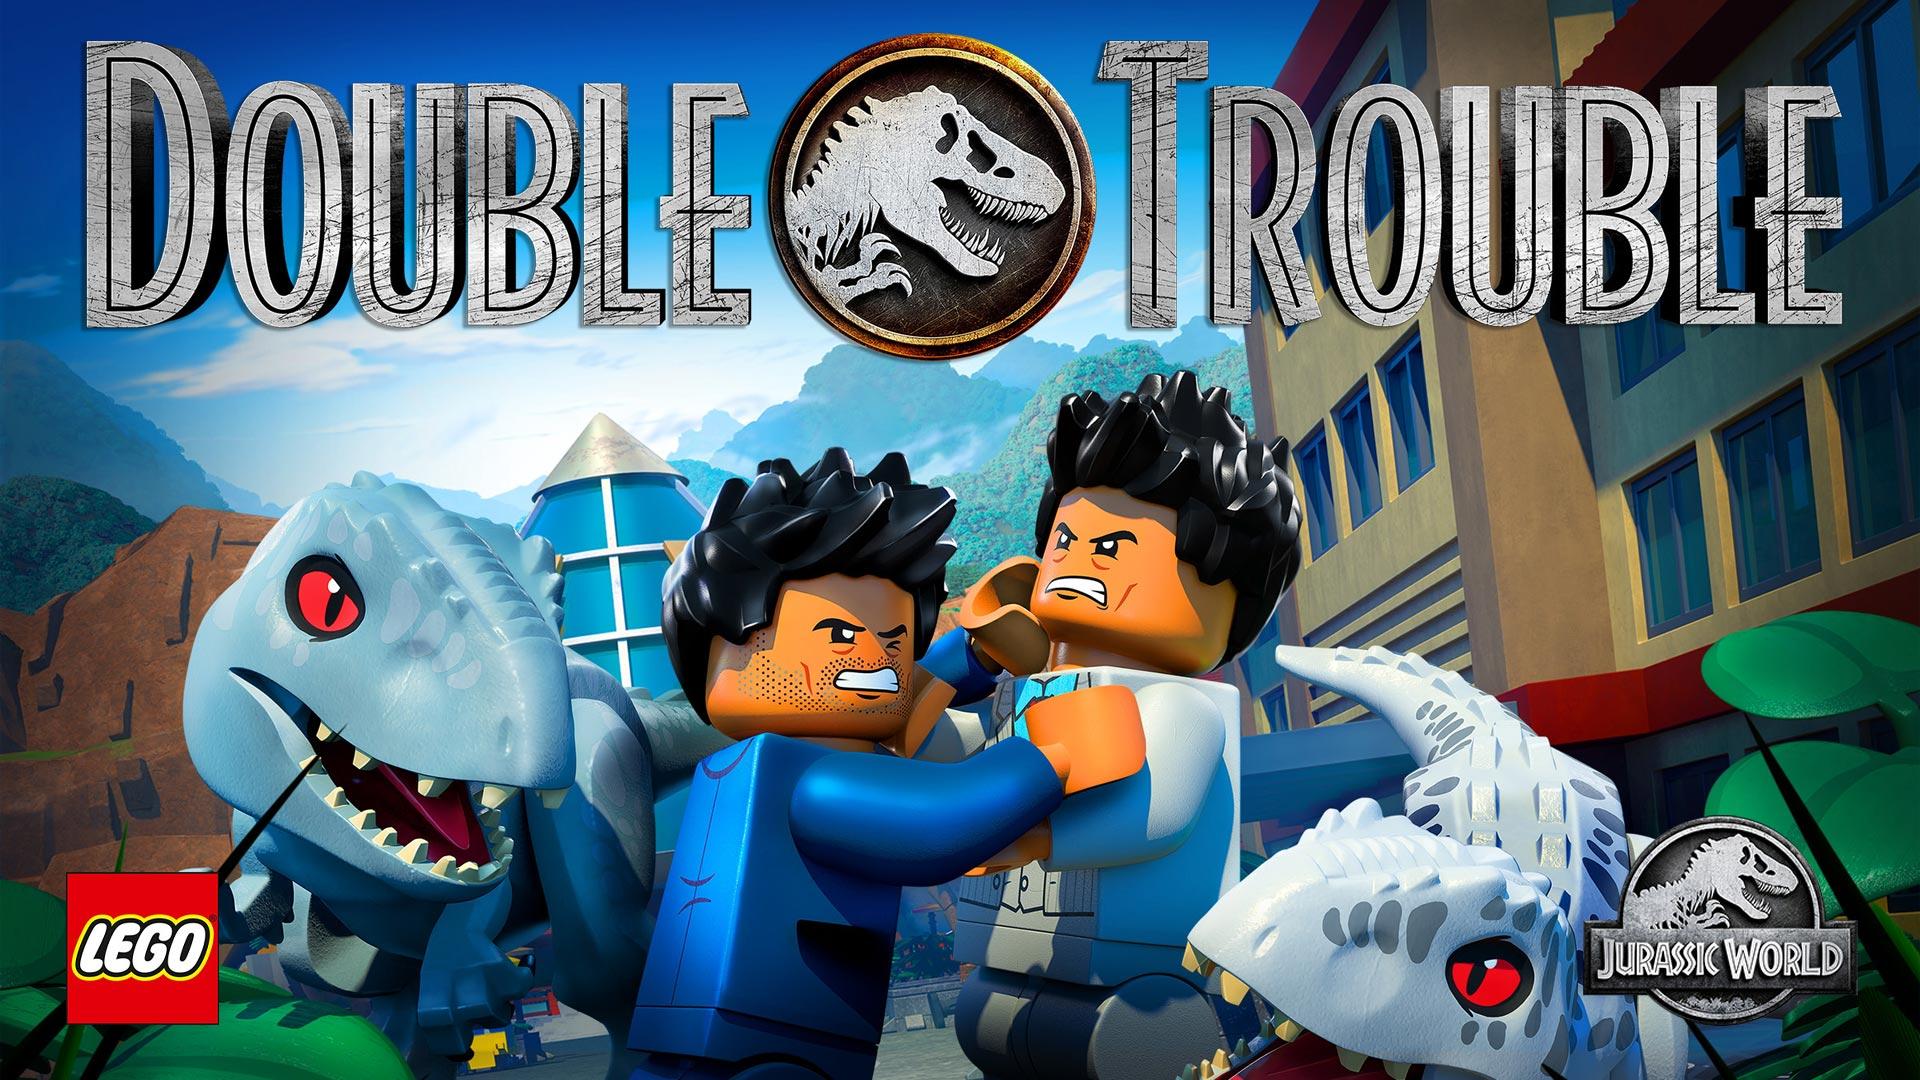 Lego Jurassic World: Double Trouble, Season 1